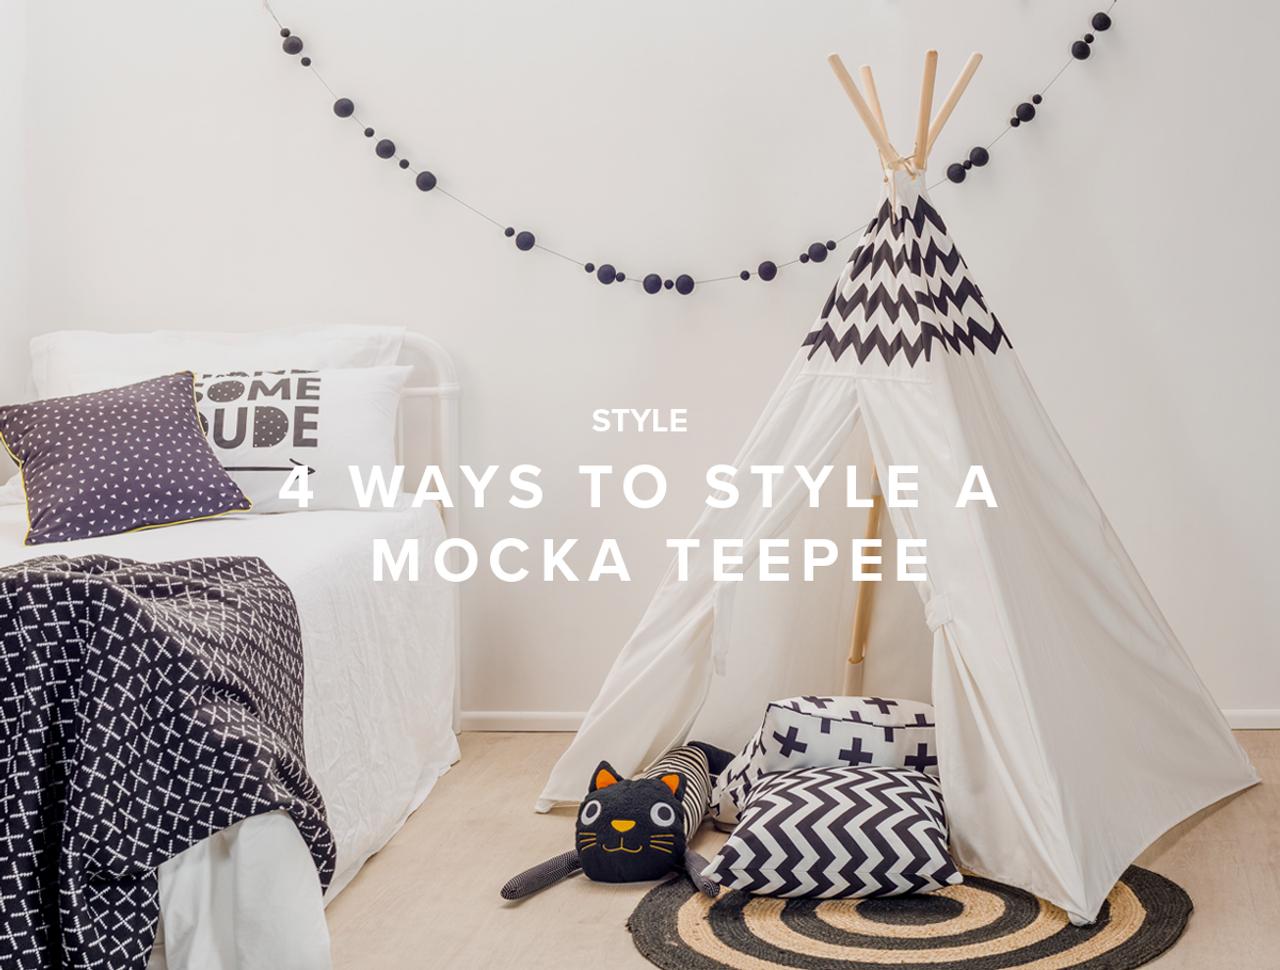 4 Ways to Style a Mocka Teepee